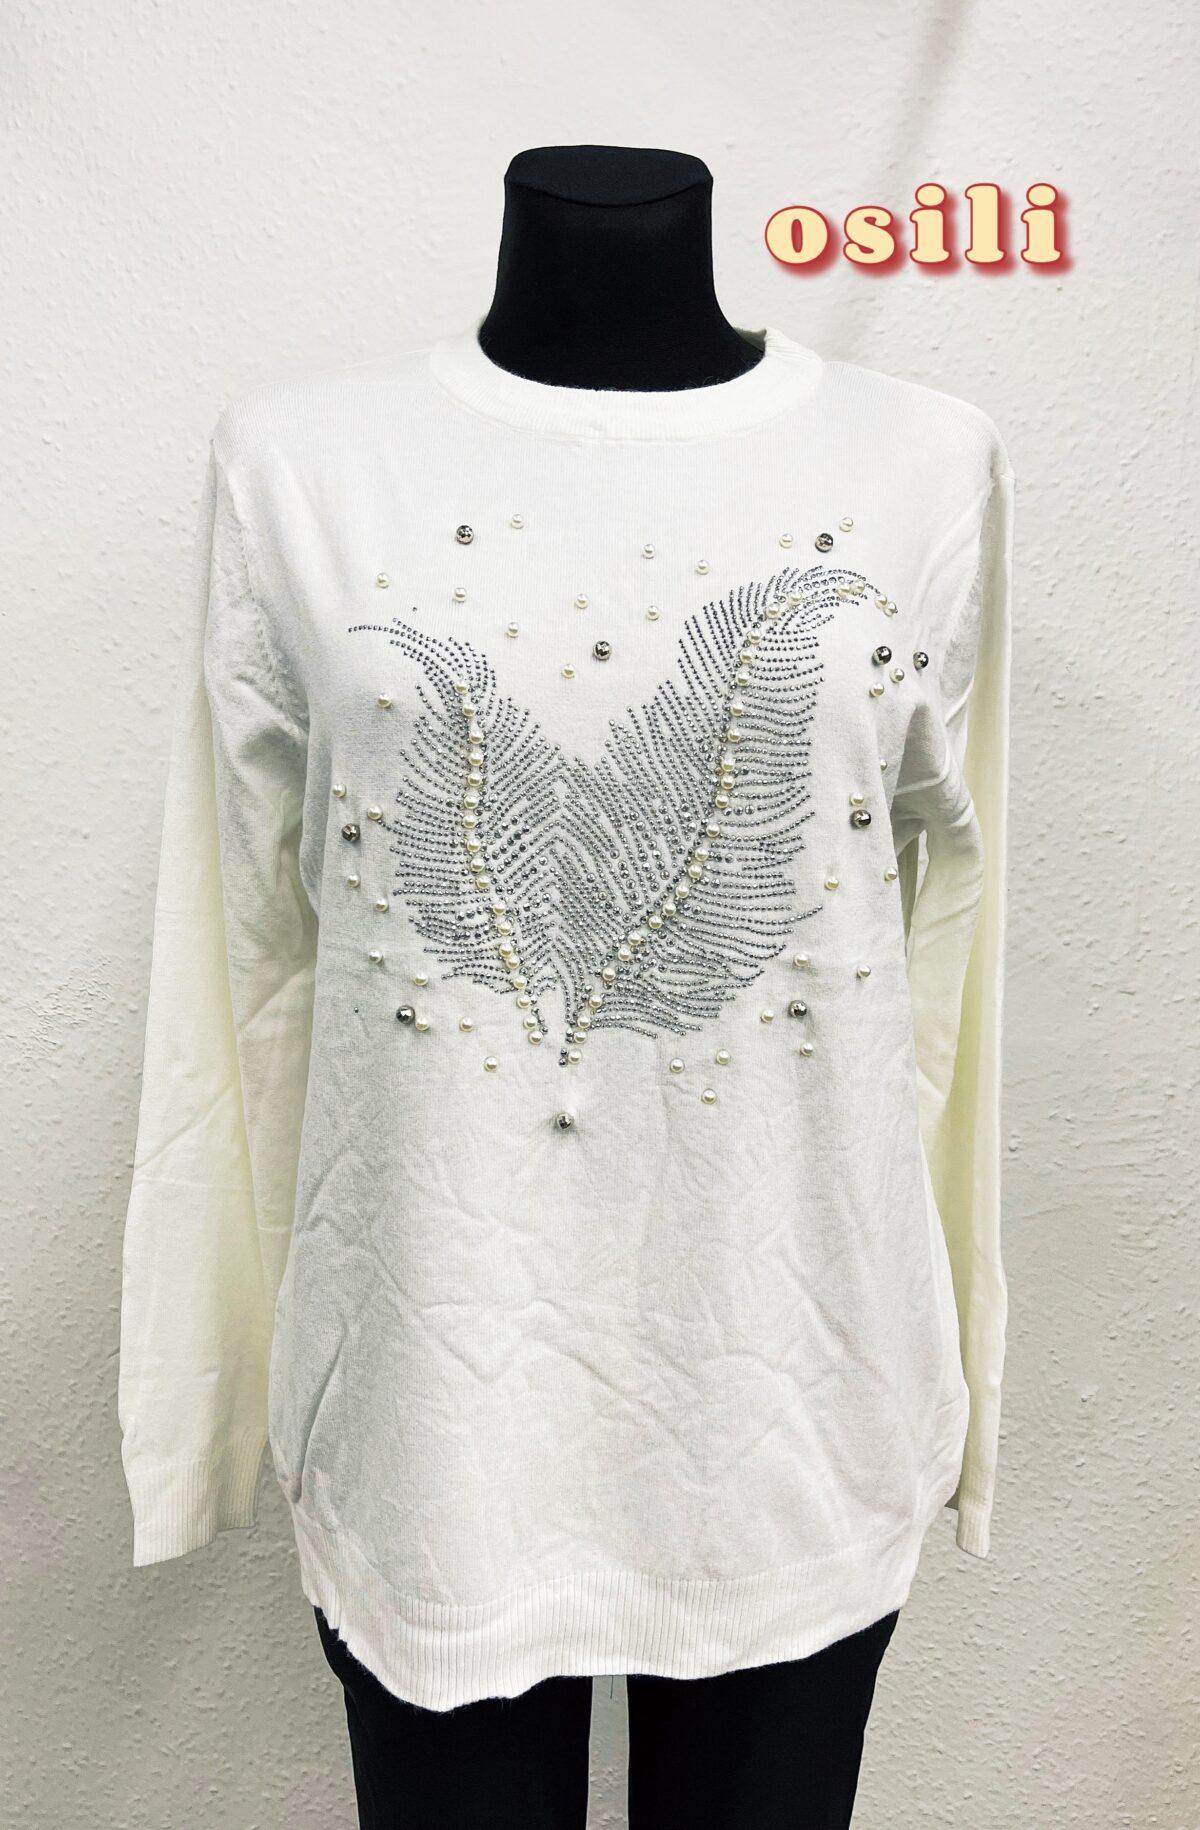 7C148B59 B5DB 4563 BC57 47BE2A220811 scaled Osili - Fashion - Divat